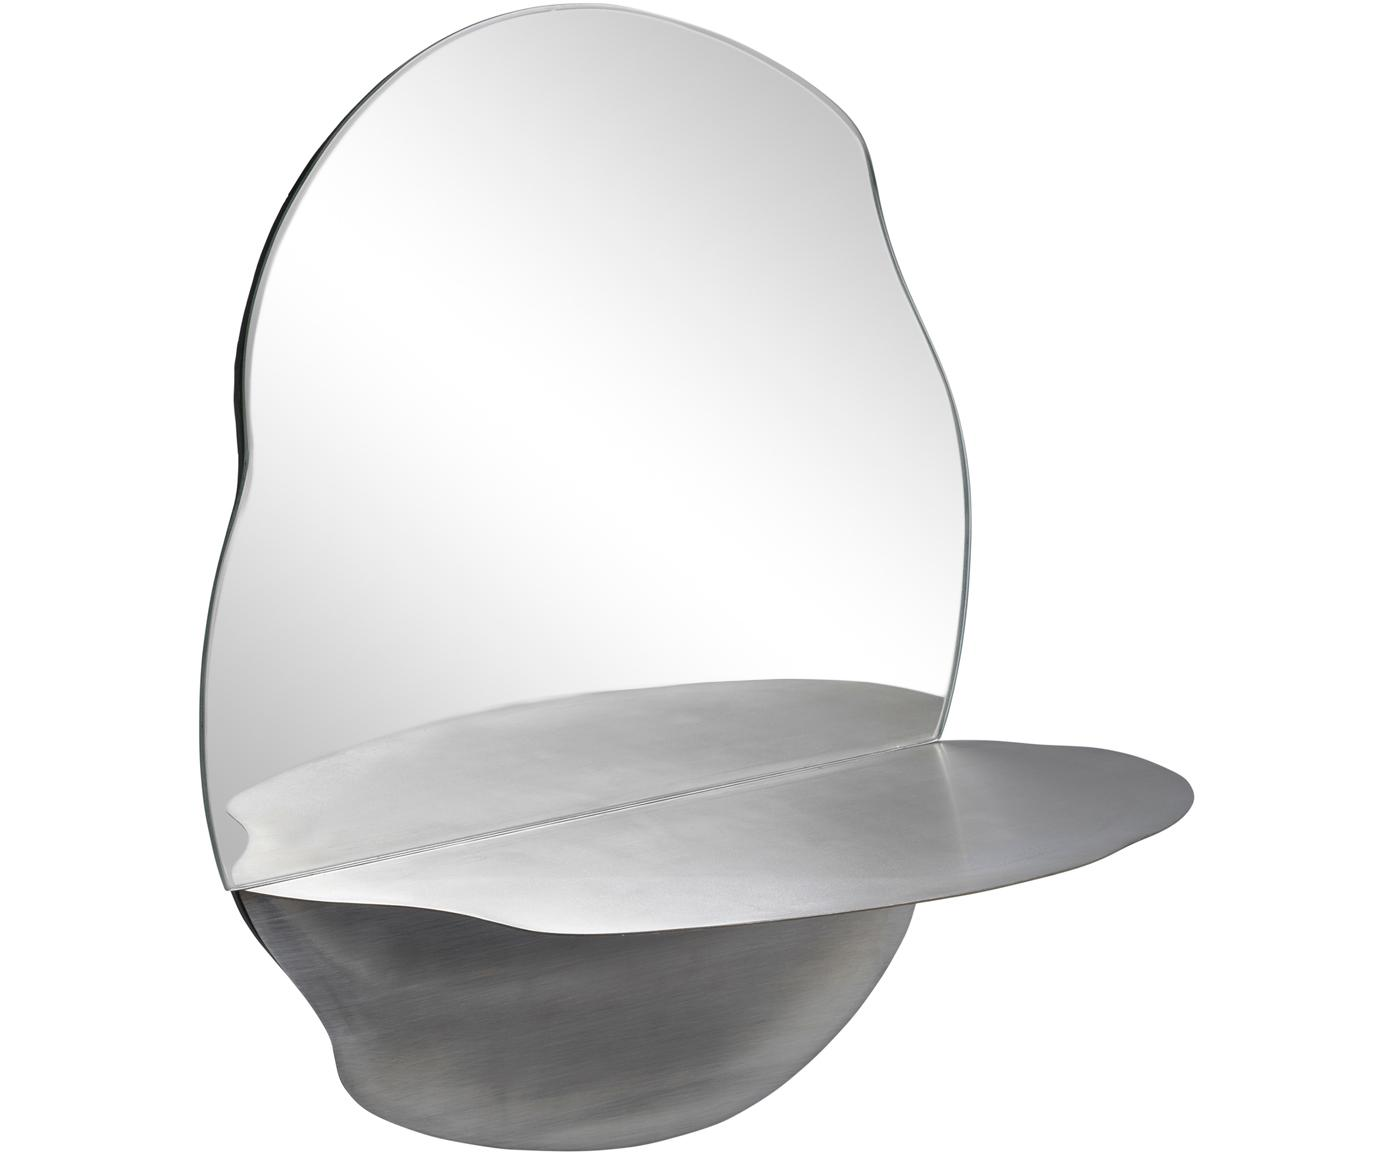 Wandspiegel Vilja mit Ablagefläche, Spiegelfläche: Spiegelglas, Ablagefläche: Metall, oxidiert, Metall, matt, 31 x 40 cm